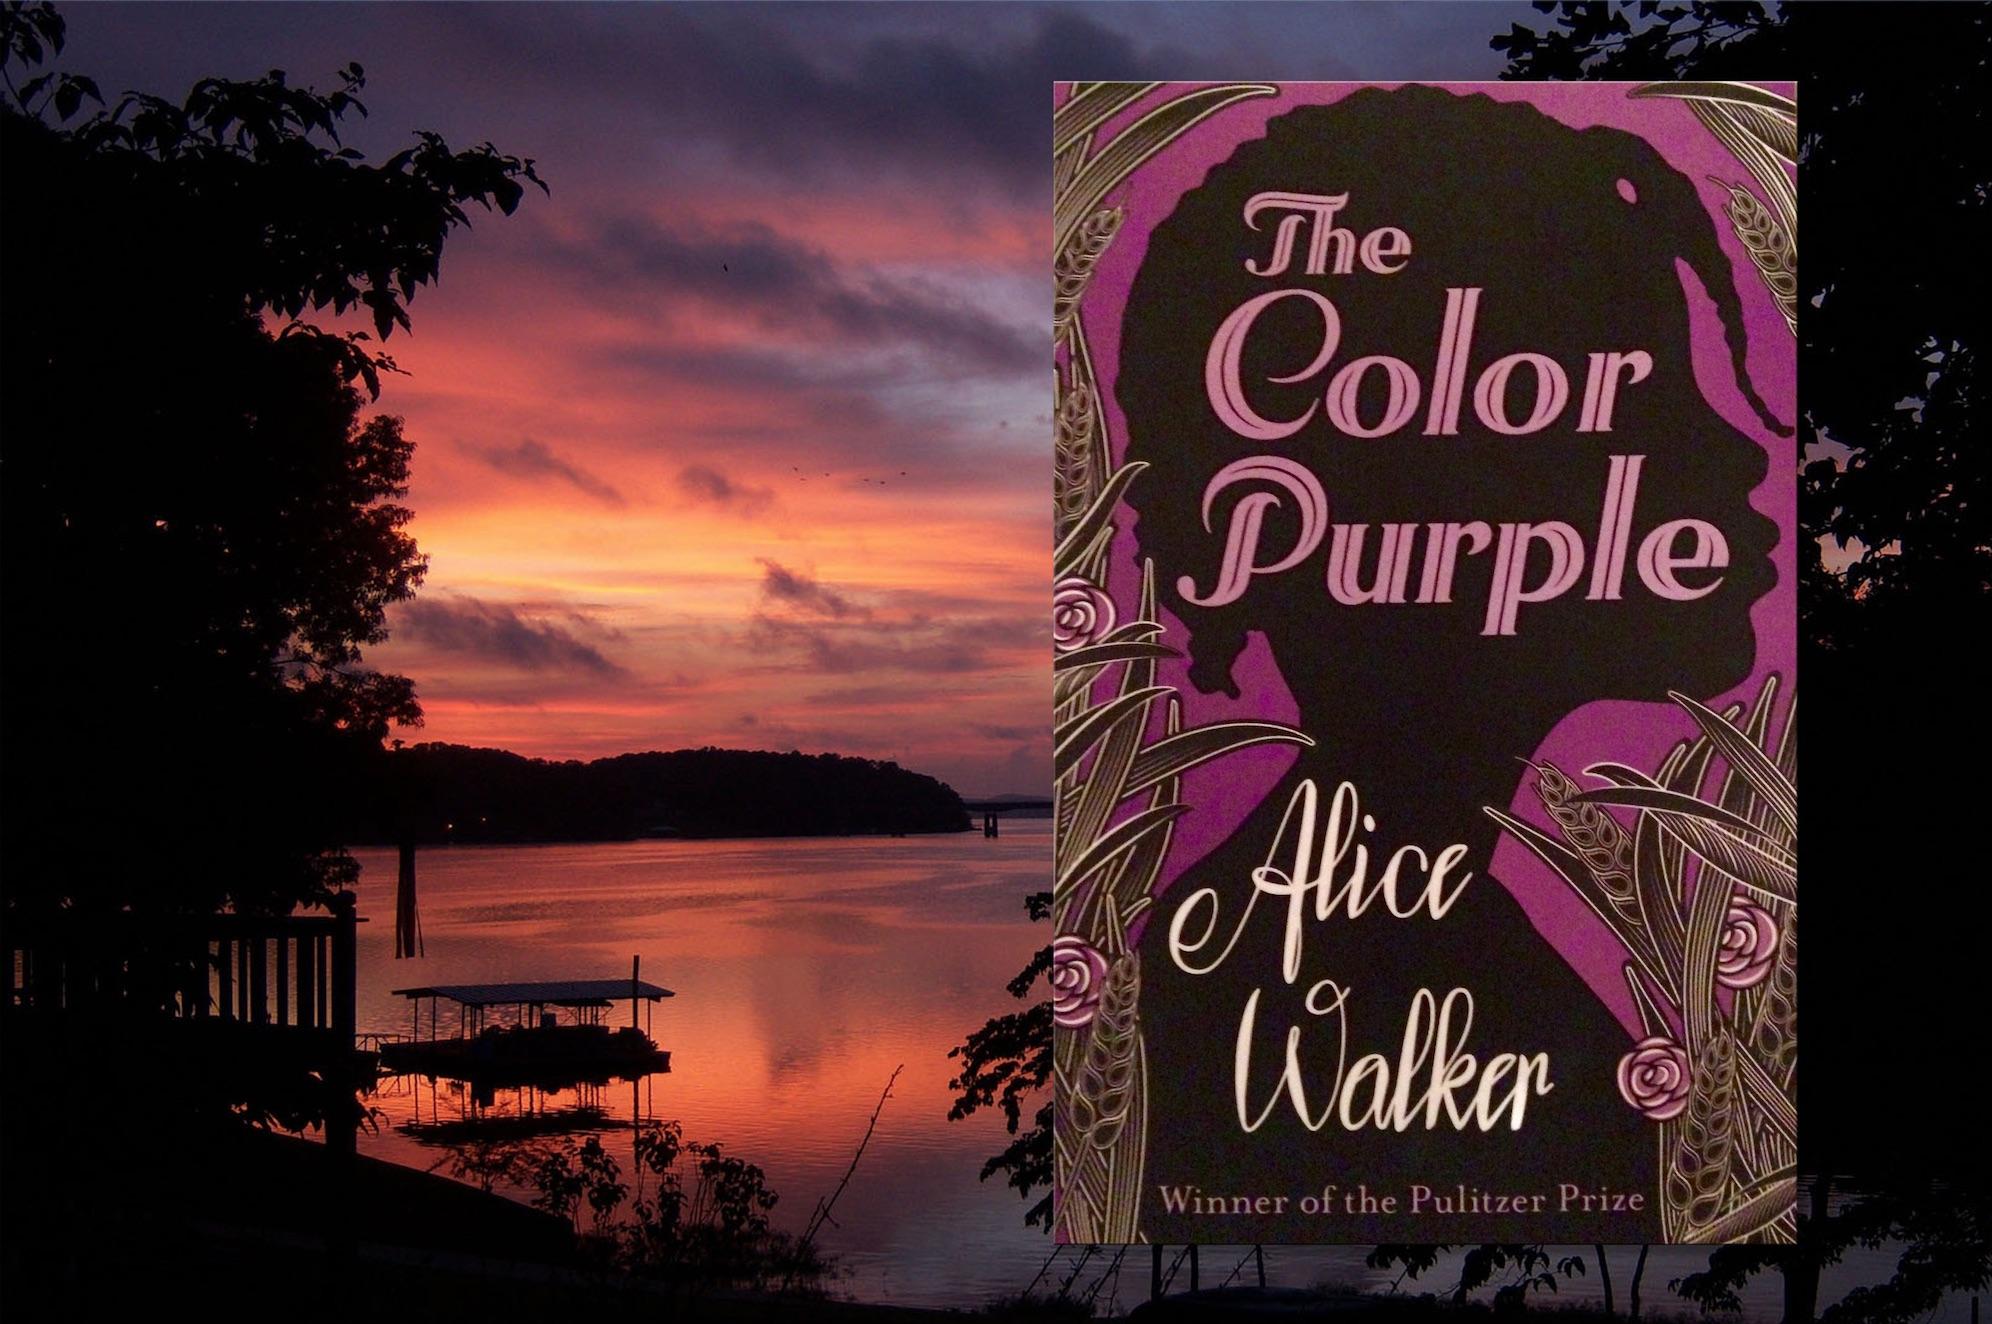 color purple copy.jpg